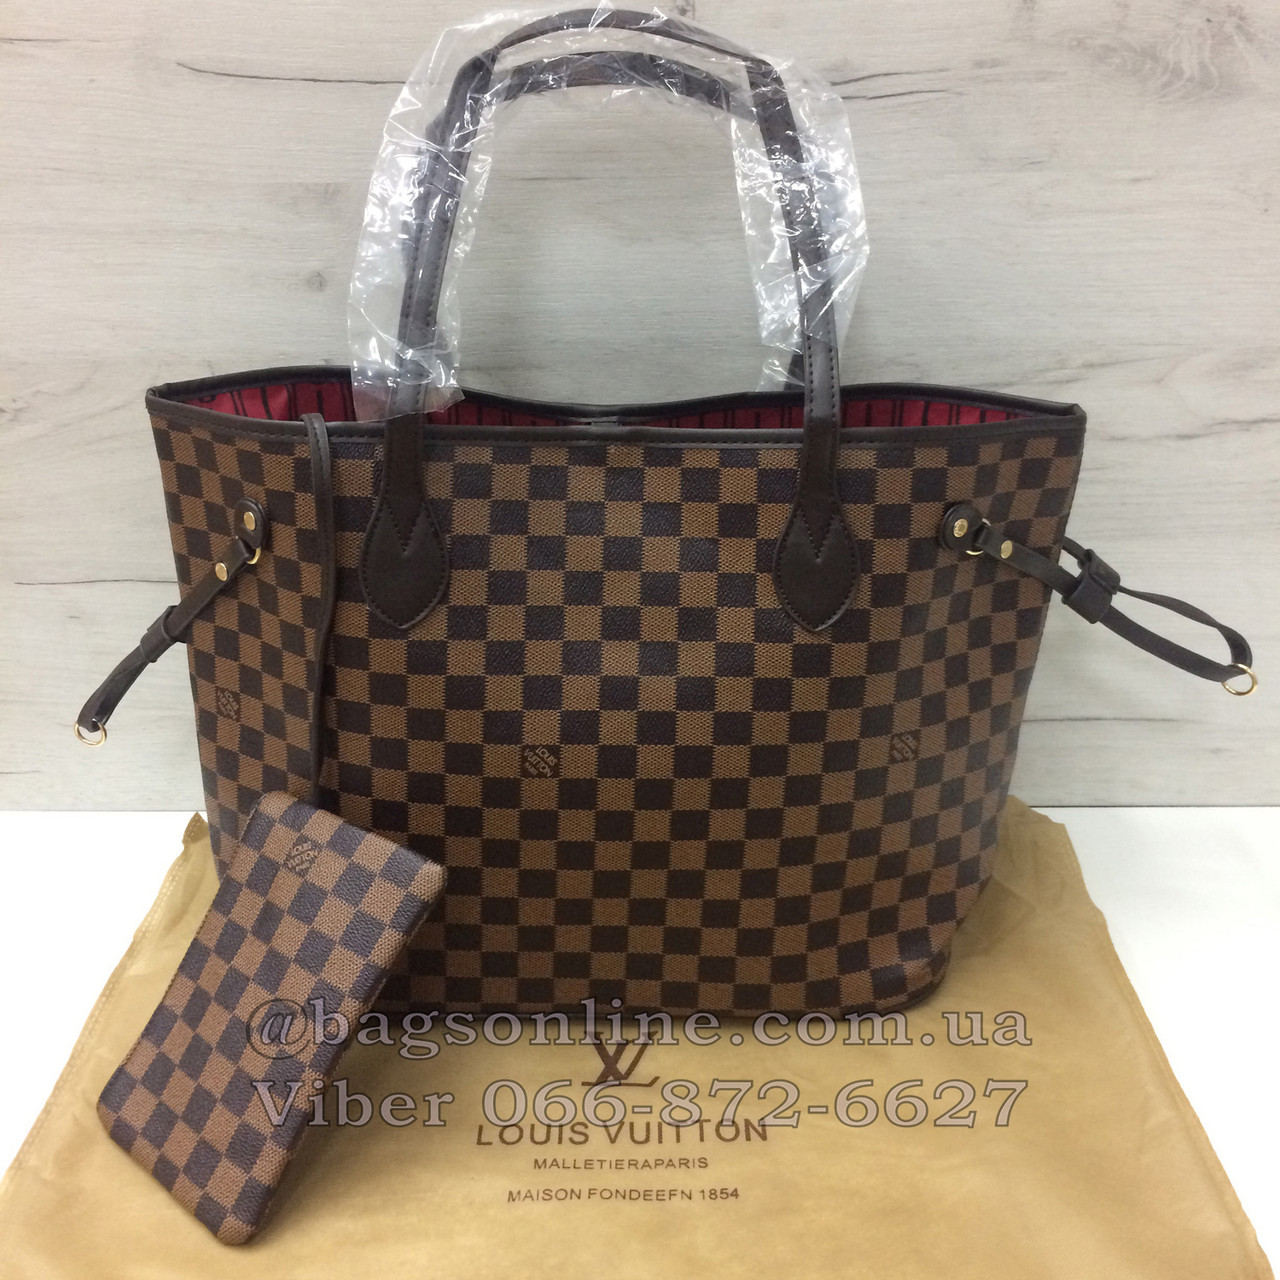 0fb94f353792 Сумка Louis Vuitton Neverfull | луи витон неверфул с косметичкой | LV ЛВ  коричневый